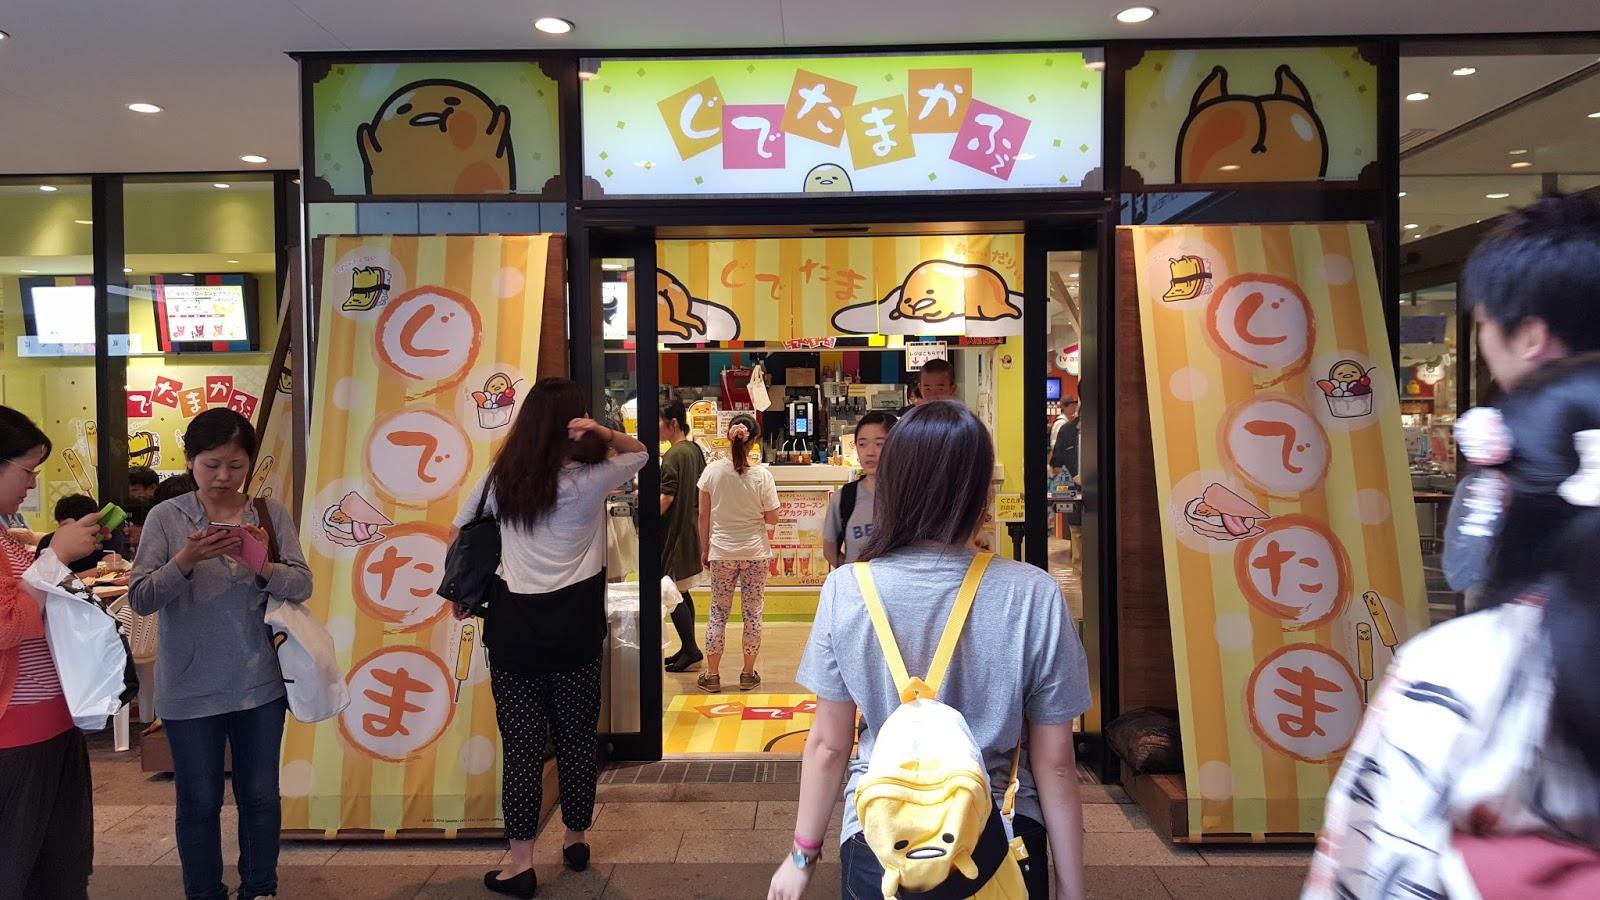 HARDCORE GUDETAMA EGG PORN @ TREEVILLAGE CAFE - SORAMACHI (TOKYO SKYTREE)